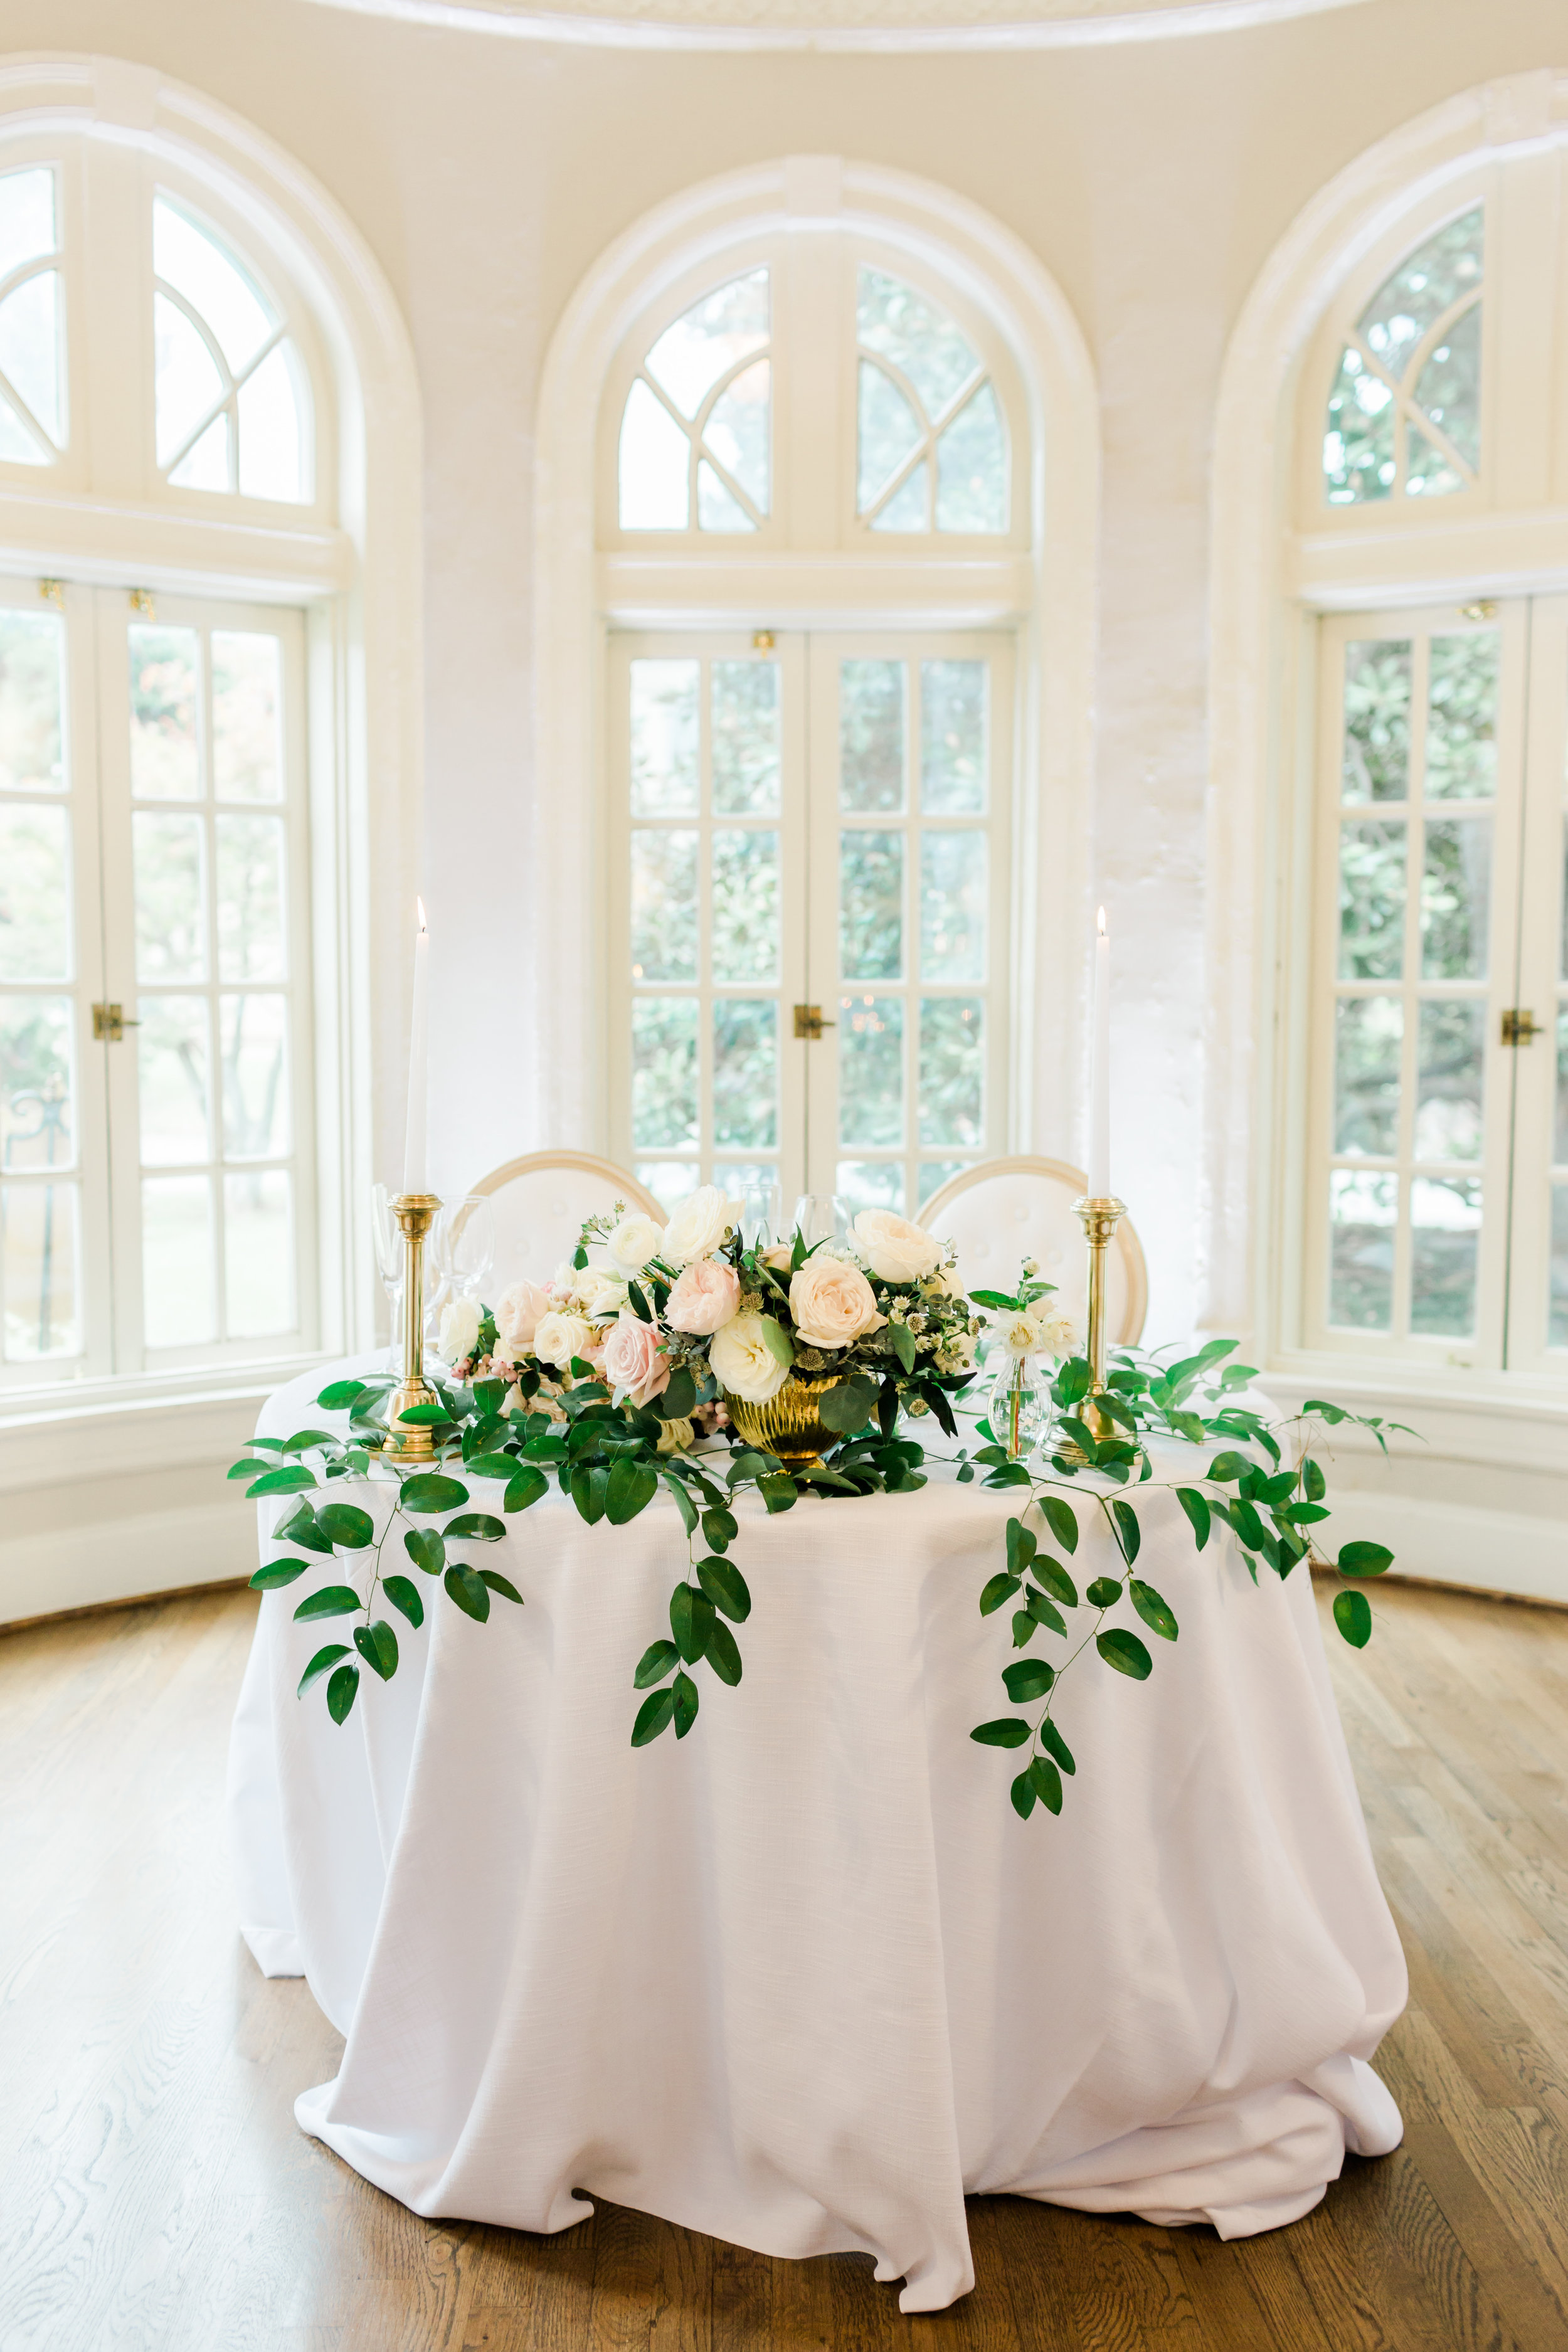 The Mansion at Woodward Park Tulsa Oklahoma Wedding_Valorie Darling Photography-6516-2.jpg